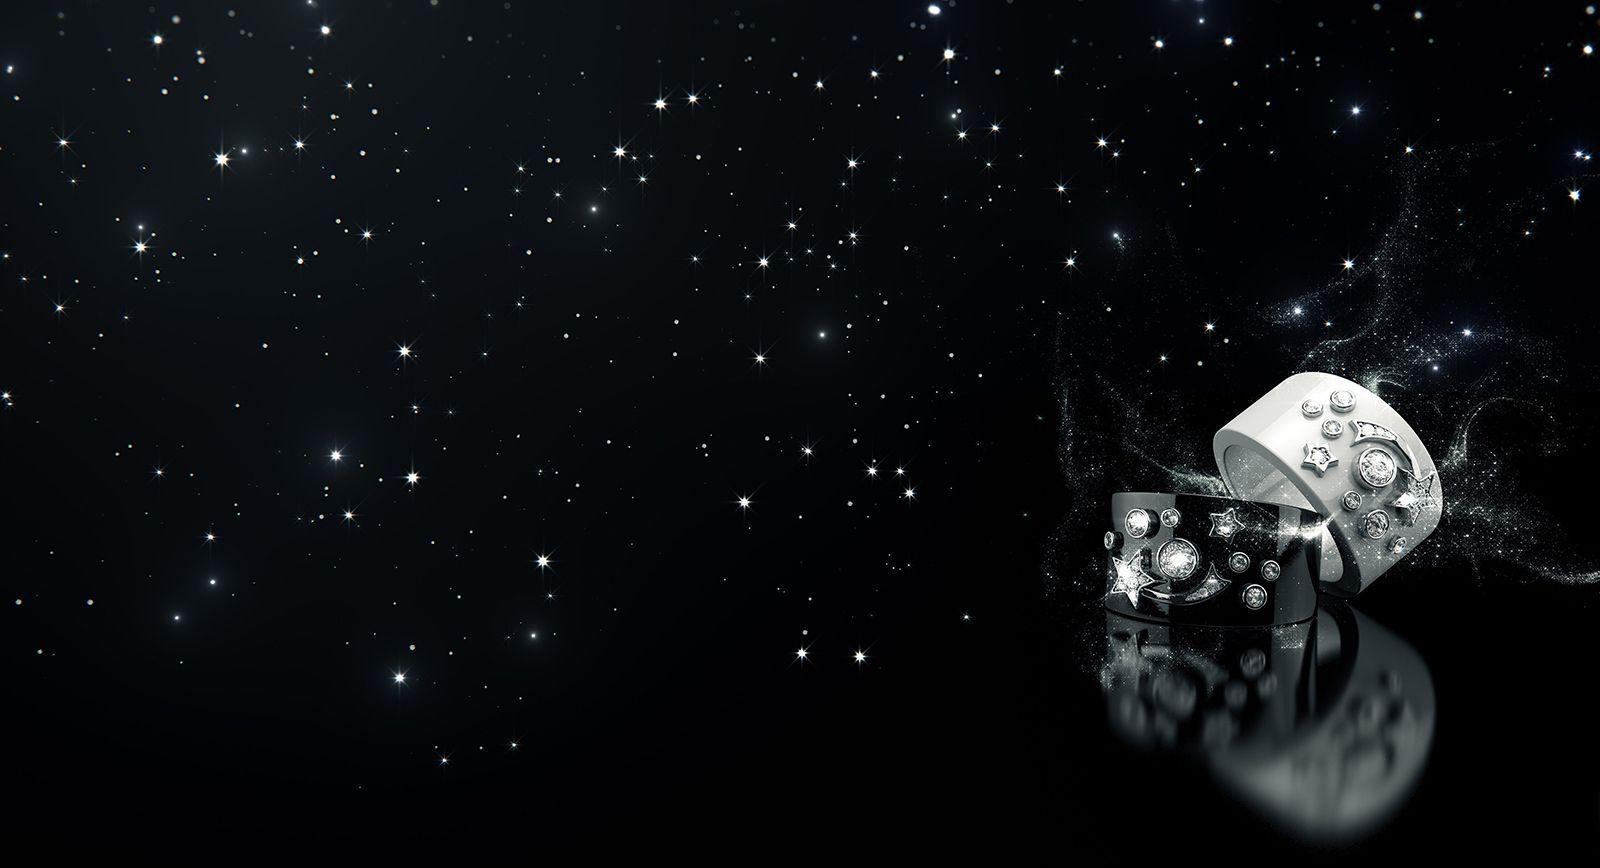 Enchanting Cosmique De Chanel Collection